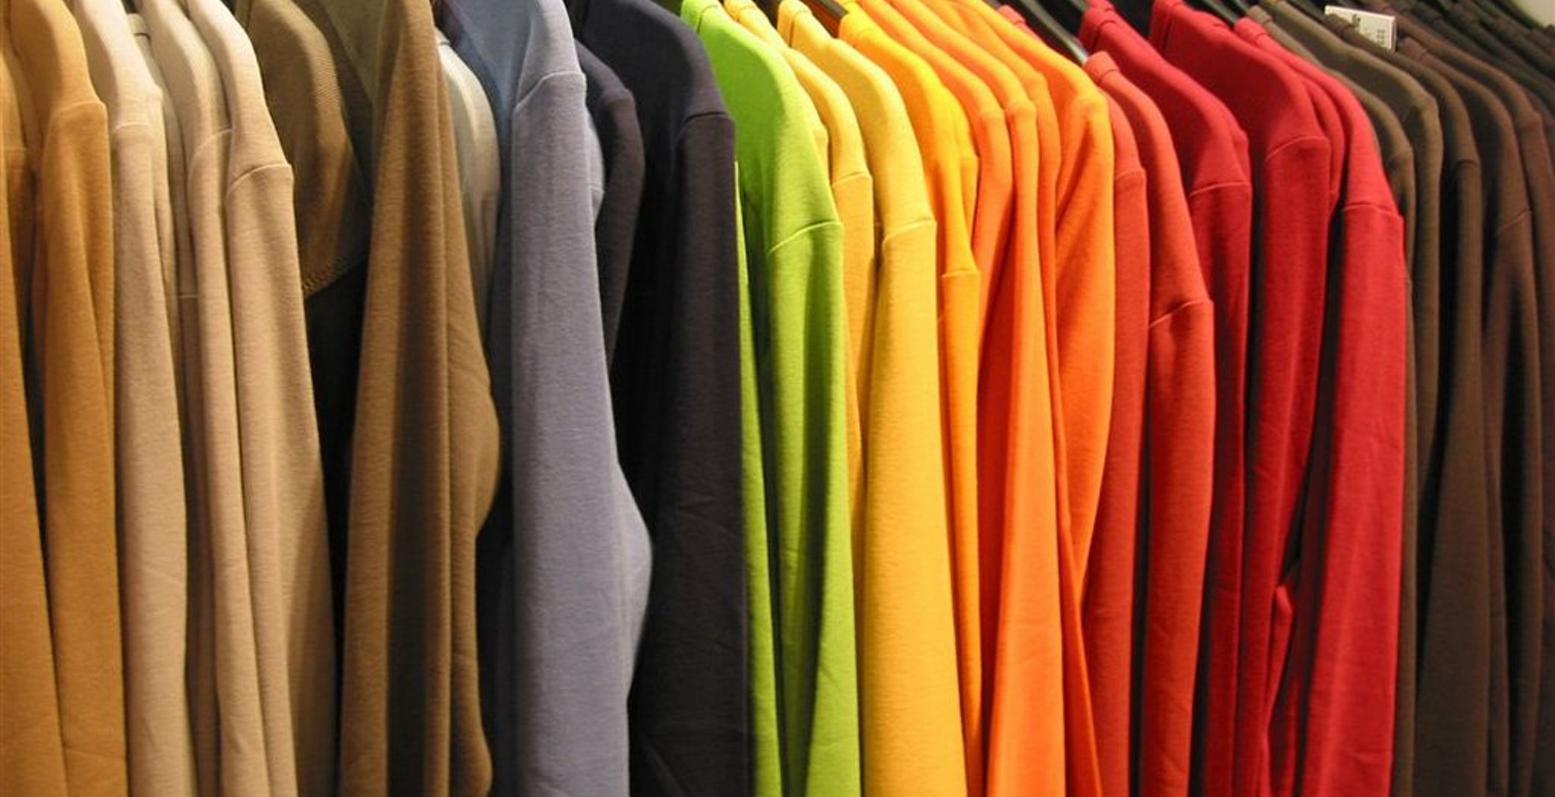 61d97a2b3bd9 Ένα χρόνο έκλεβε συνέχεια ρούχα από κατάστημα - Η αξία των κλοπιμαίων άνω  των 50.000 ευρώ